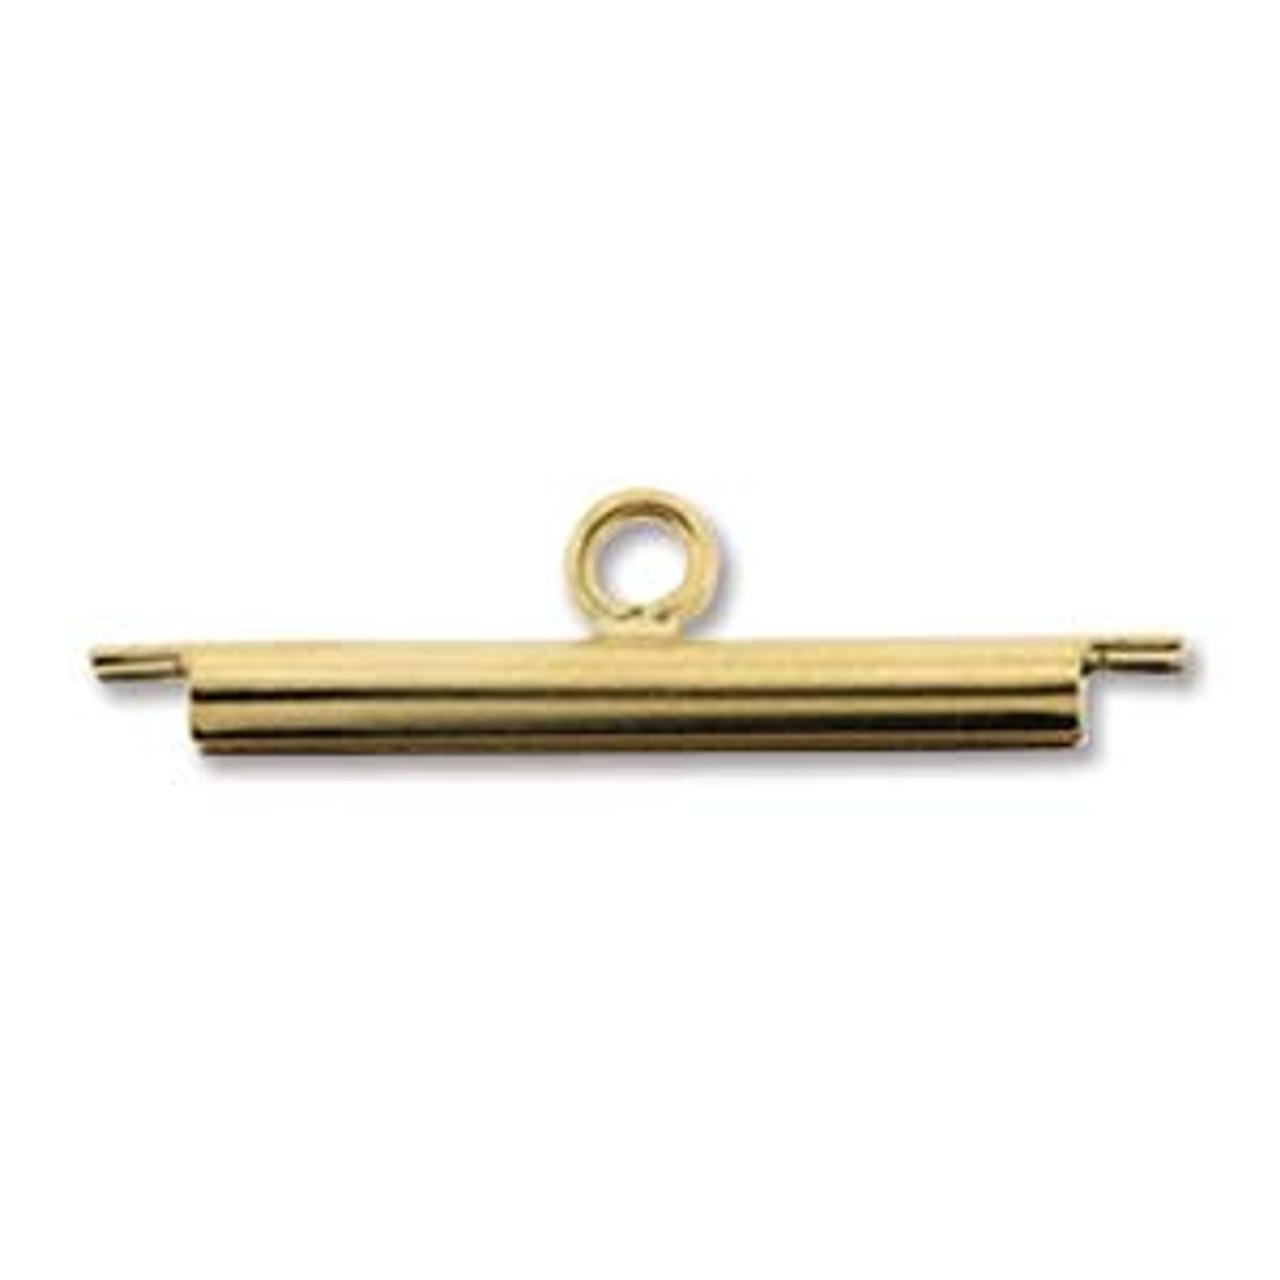 20mm Gold Plated Slide Tube (1 Set)